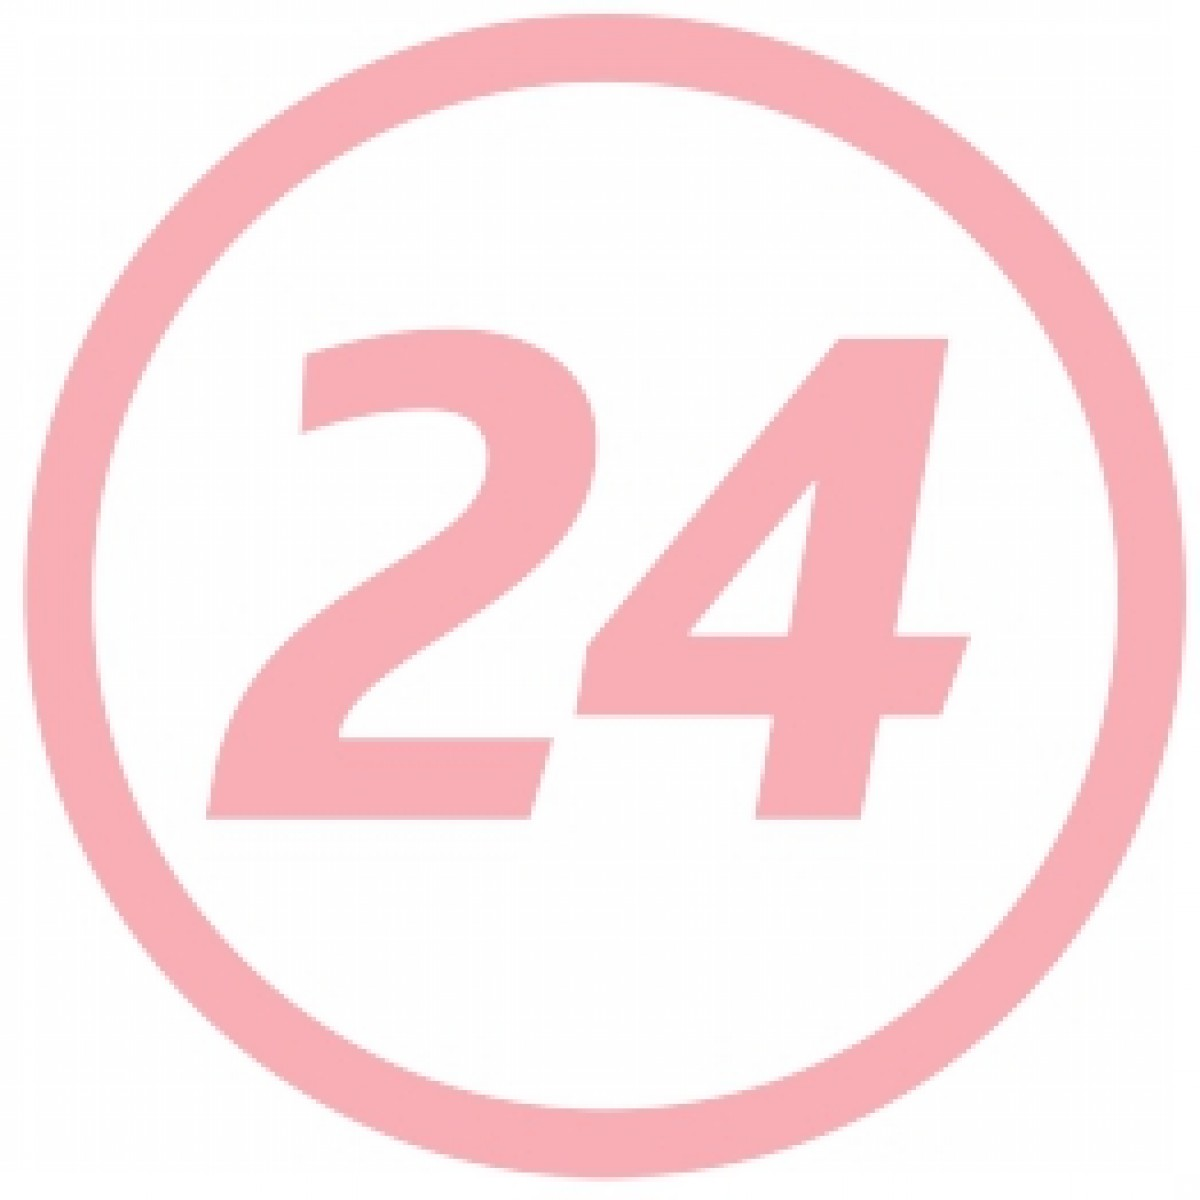 AVENE Cicalfate Crema Reparatoare Pt Piele Sensibila, Crema, 15ml